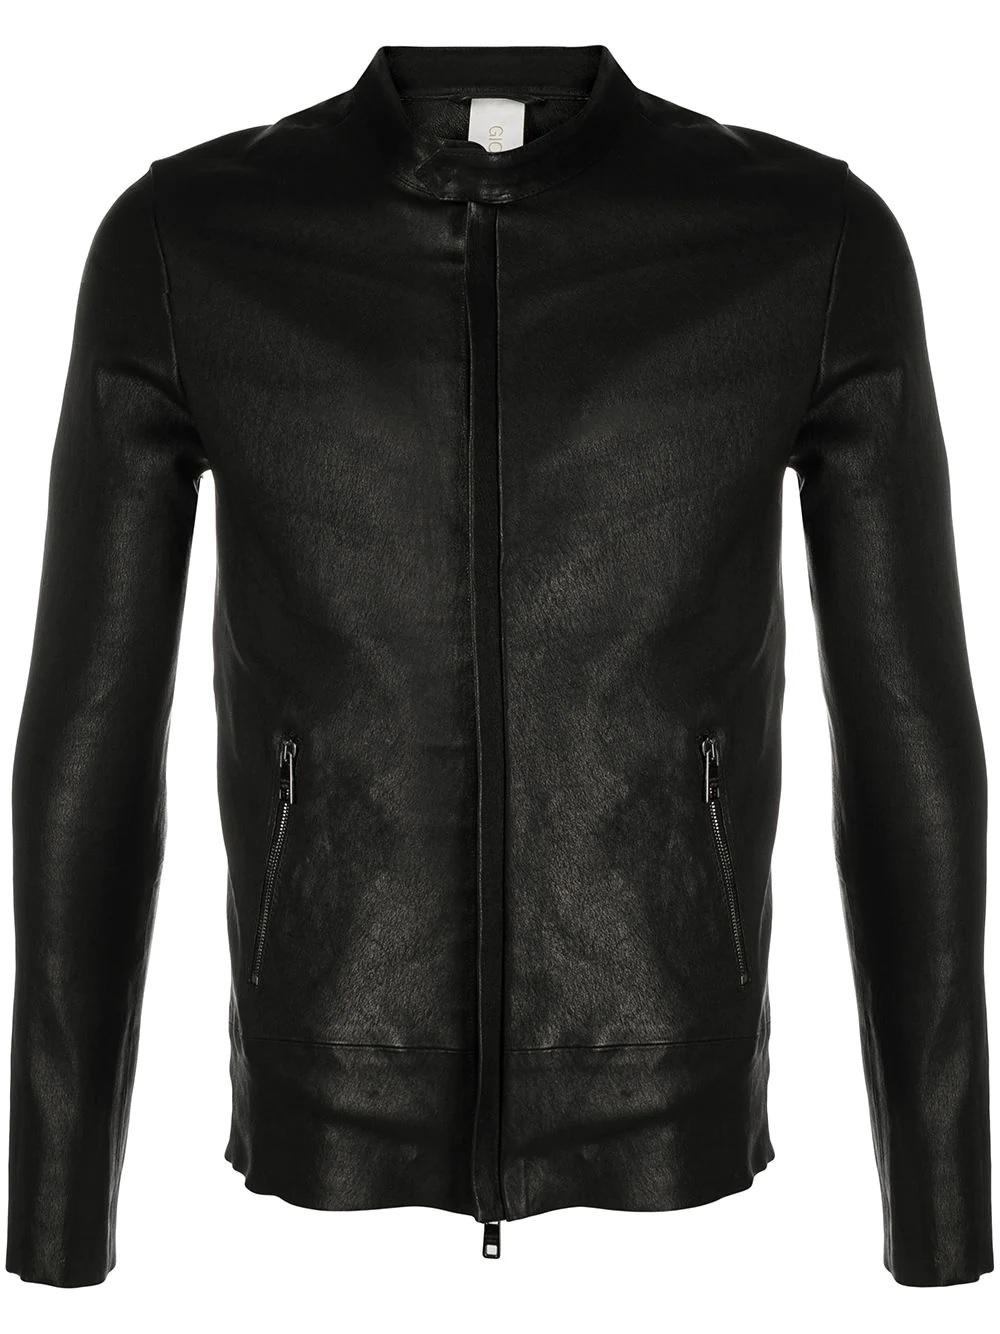 Giorgio Brato ジップアップ レザージャケット - ブラック (18633946748) Farfetch